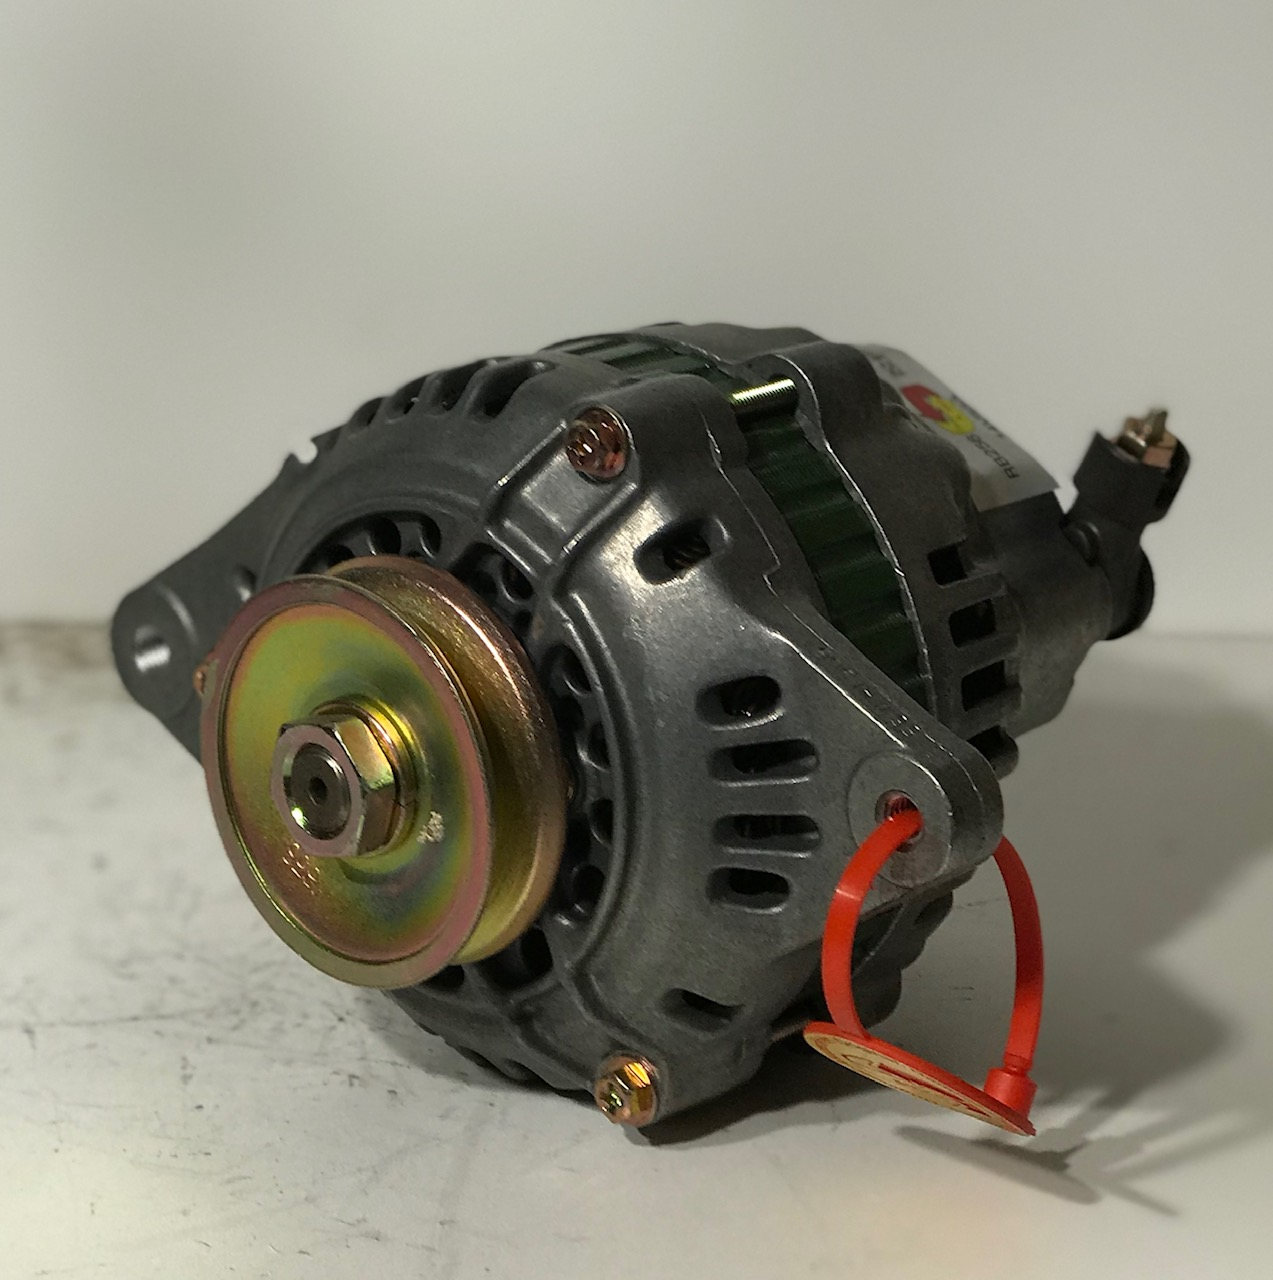 Mitsubishi Lichtmaschine 0986035791 RB256 14V Alternateur Alternator Generator